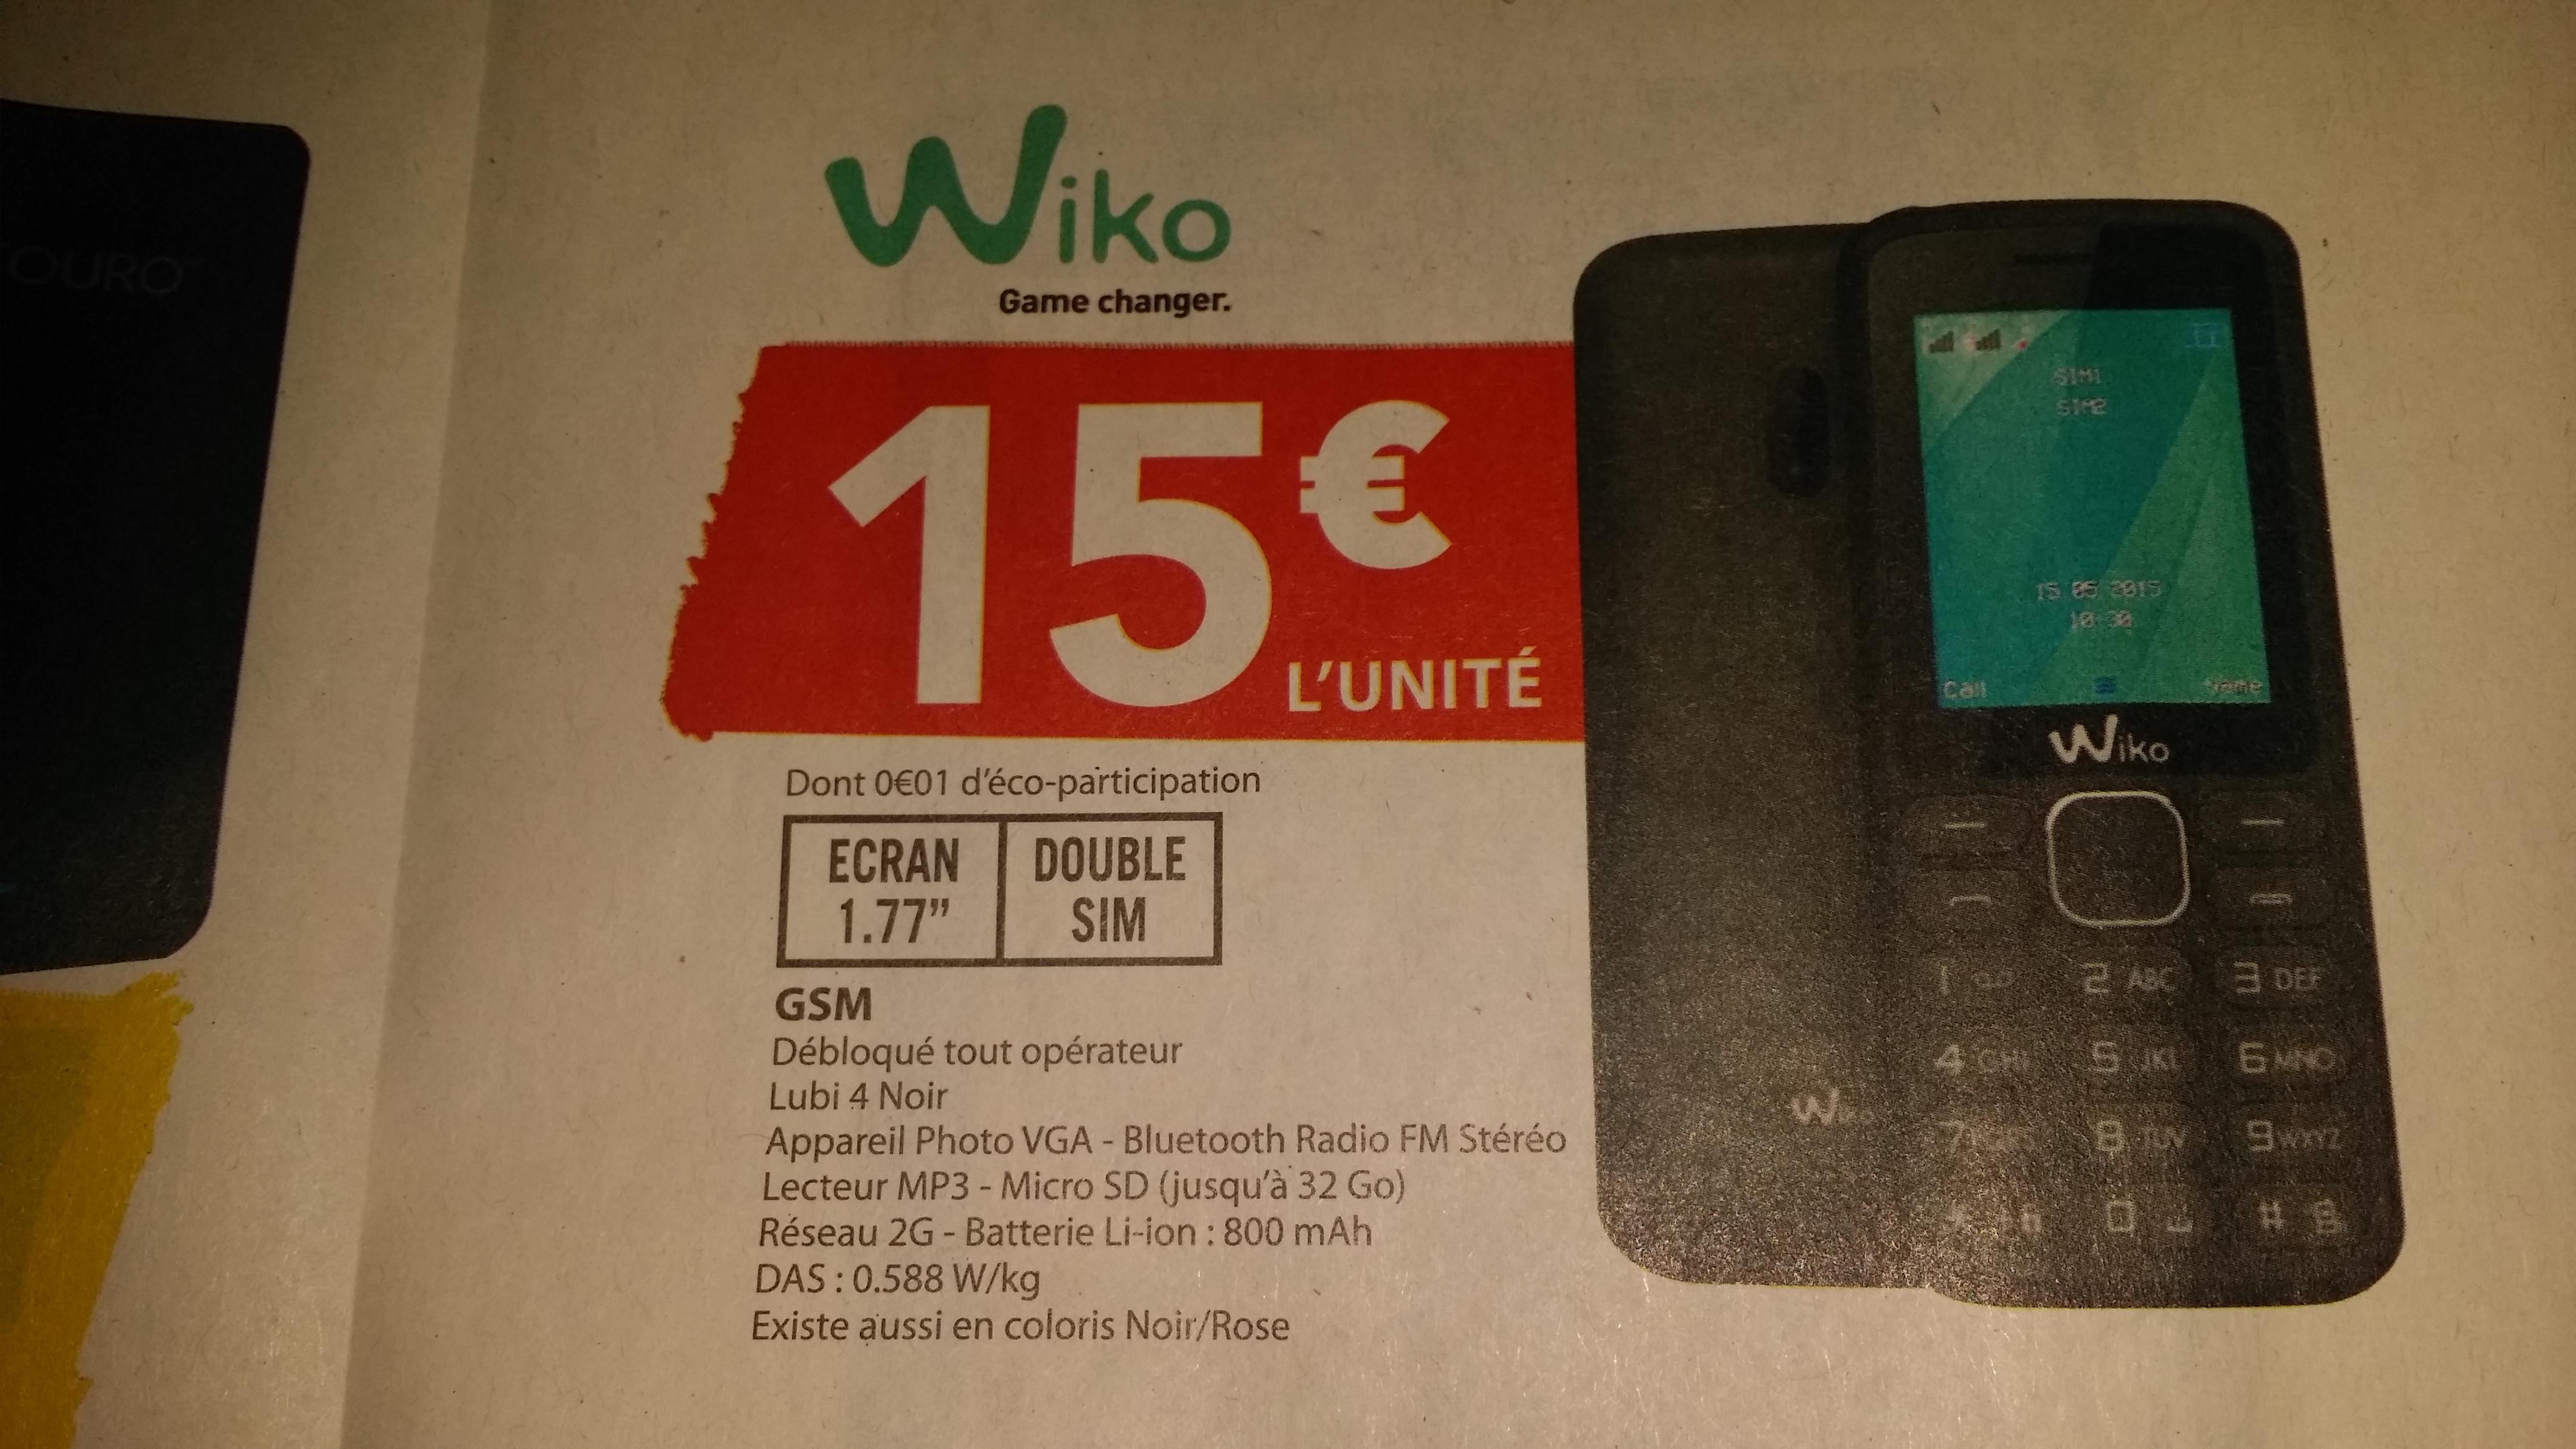 Téléphone Wiko Lubi 4 (Dual SIM) - Noir ou Rose